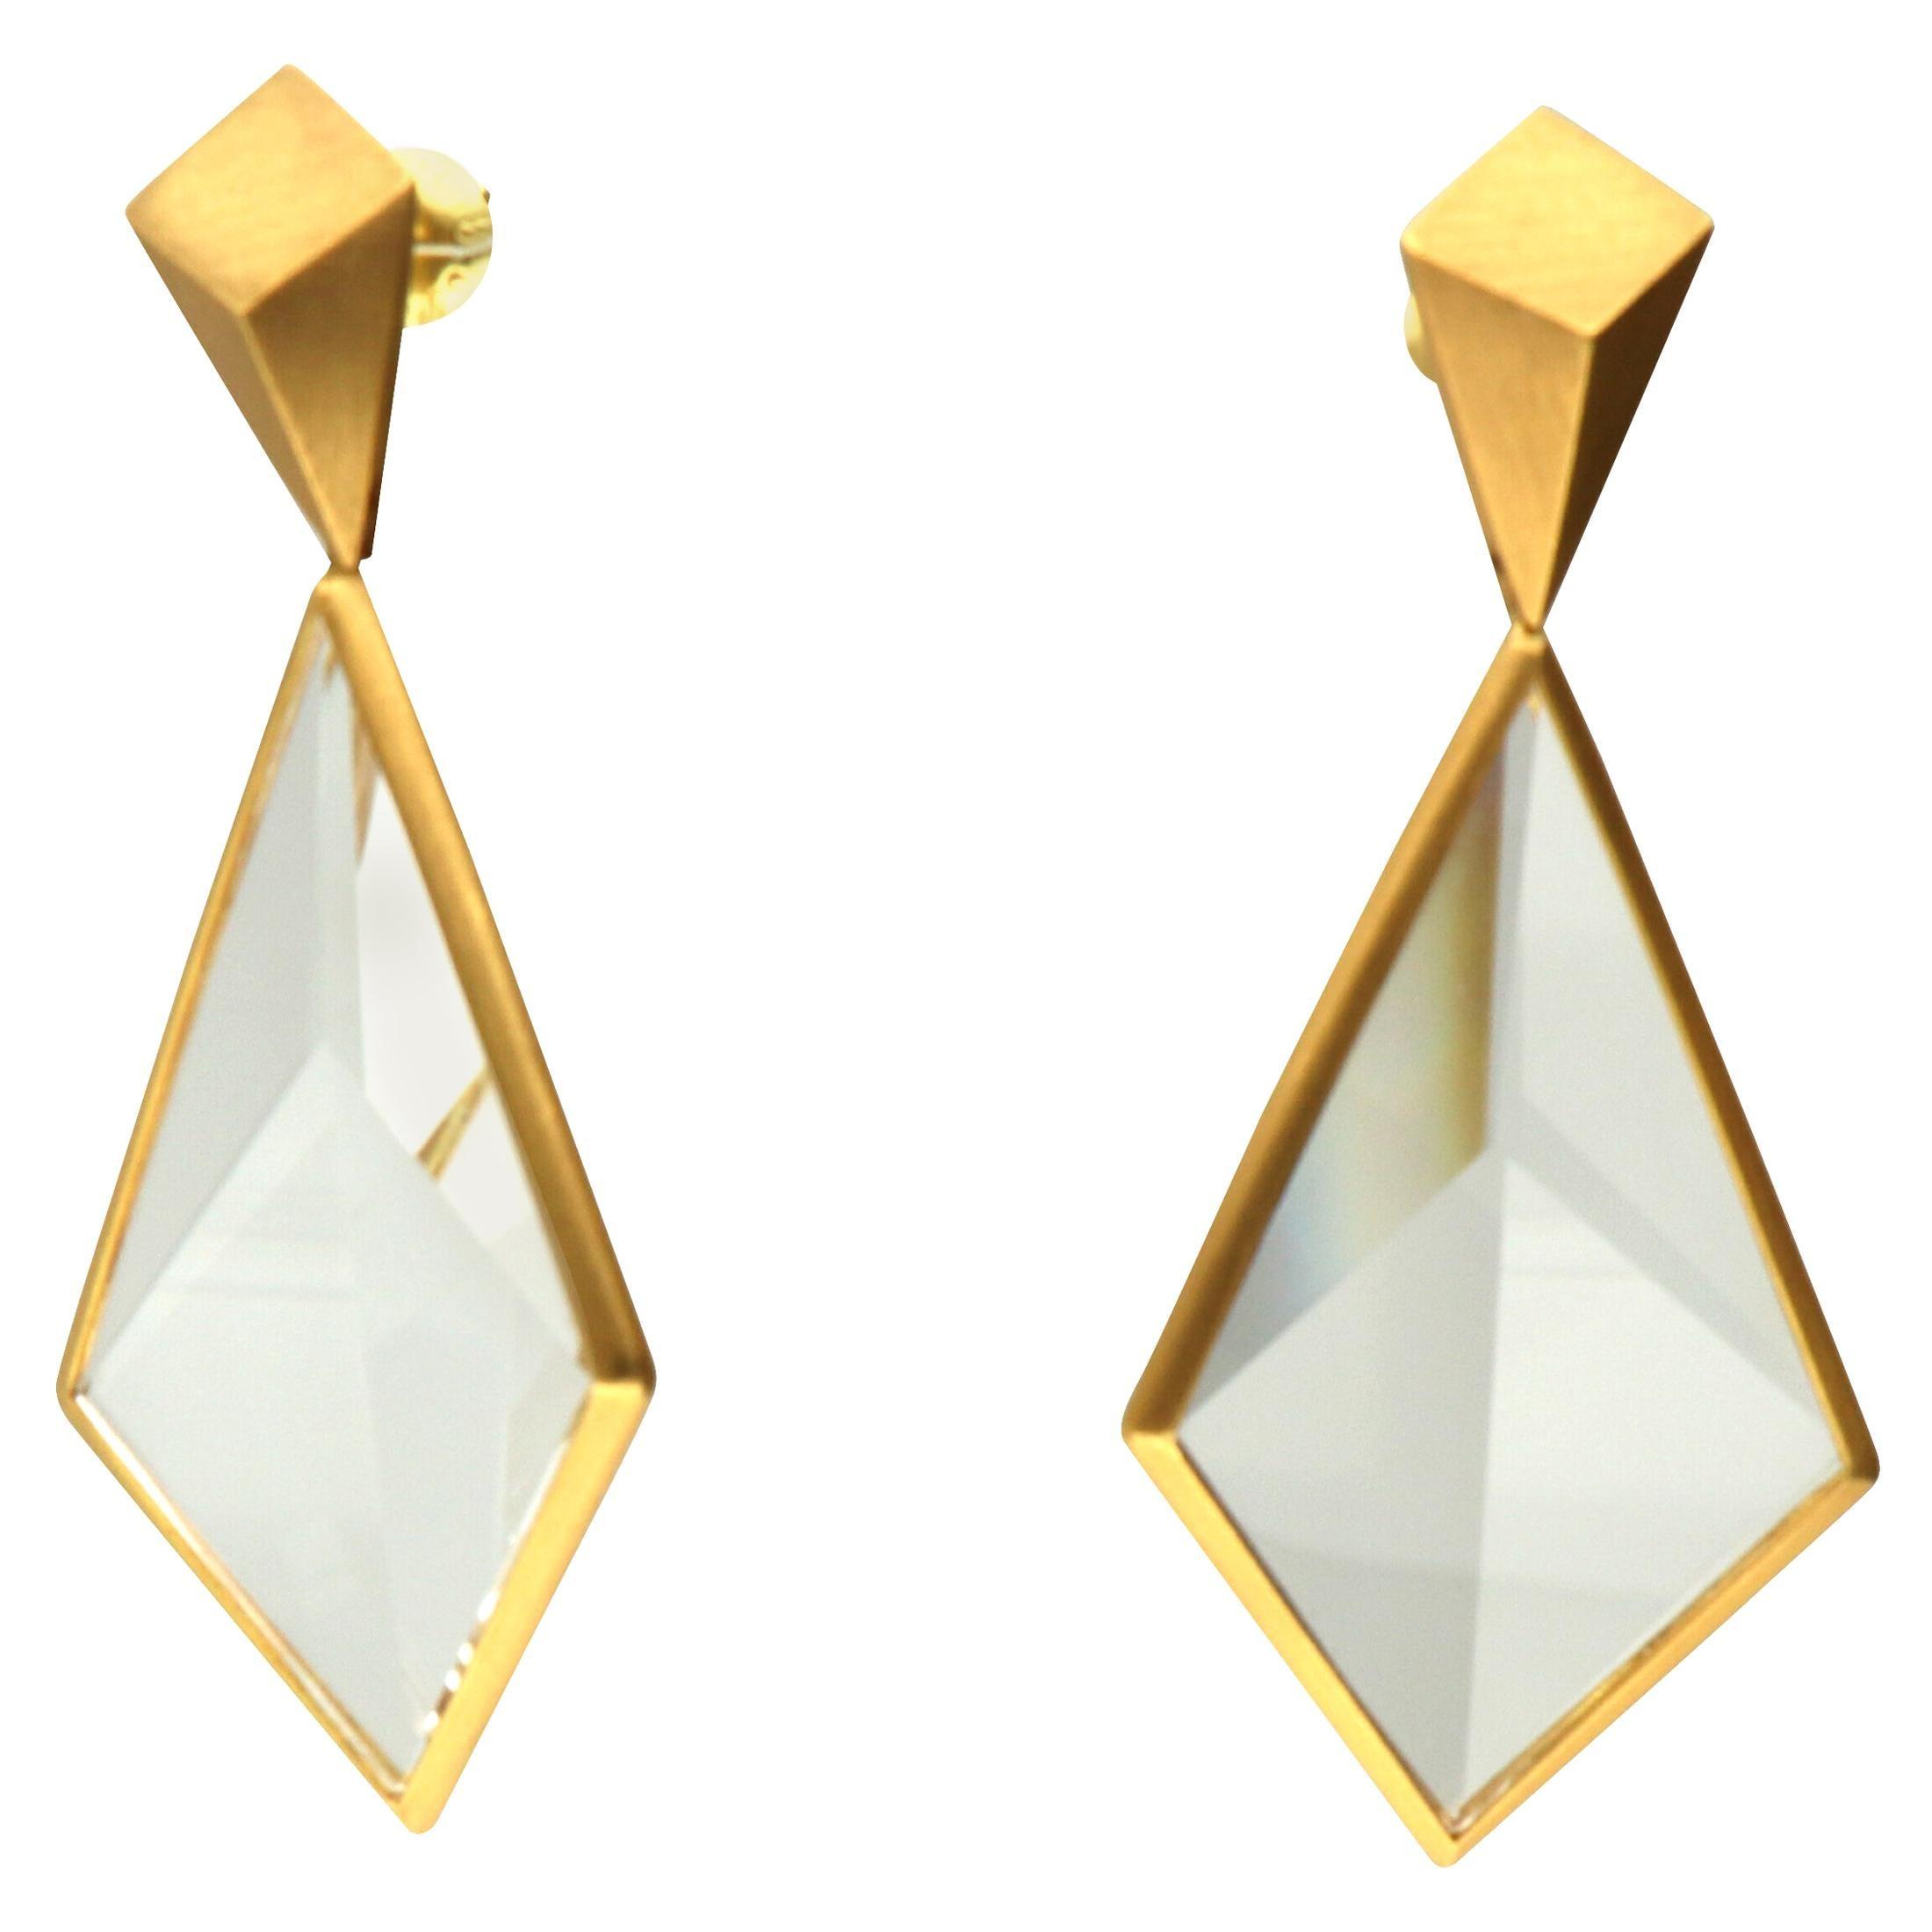 Antonio Bernardo 'Planos' Gold Crystal Quartz Earrings